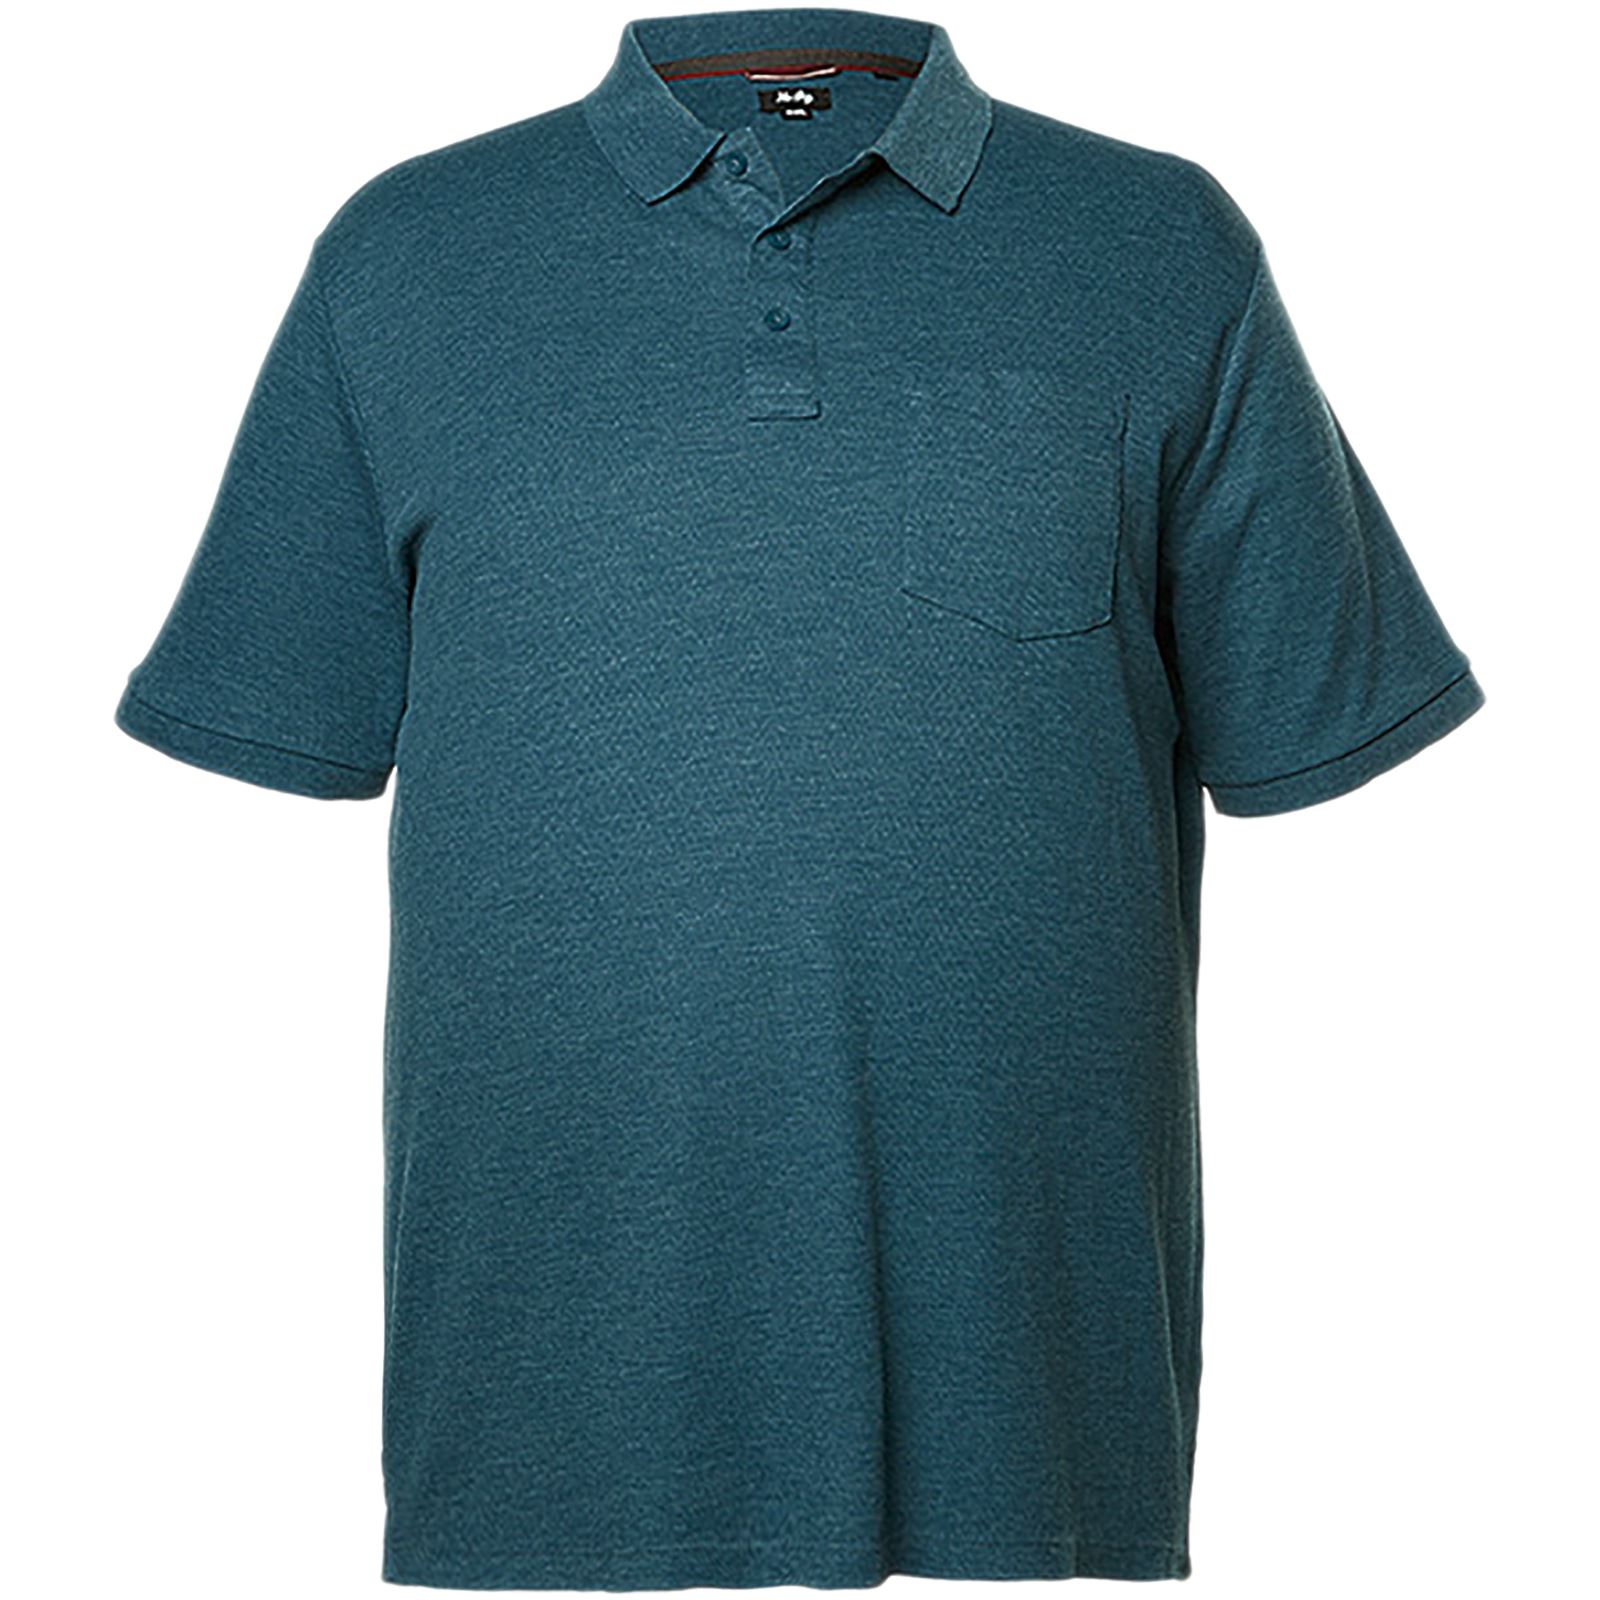 Mens King Big Size Pique Polo Poly Cotton T Shirt Casual